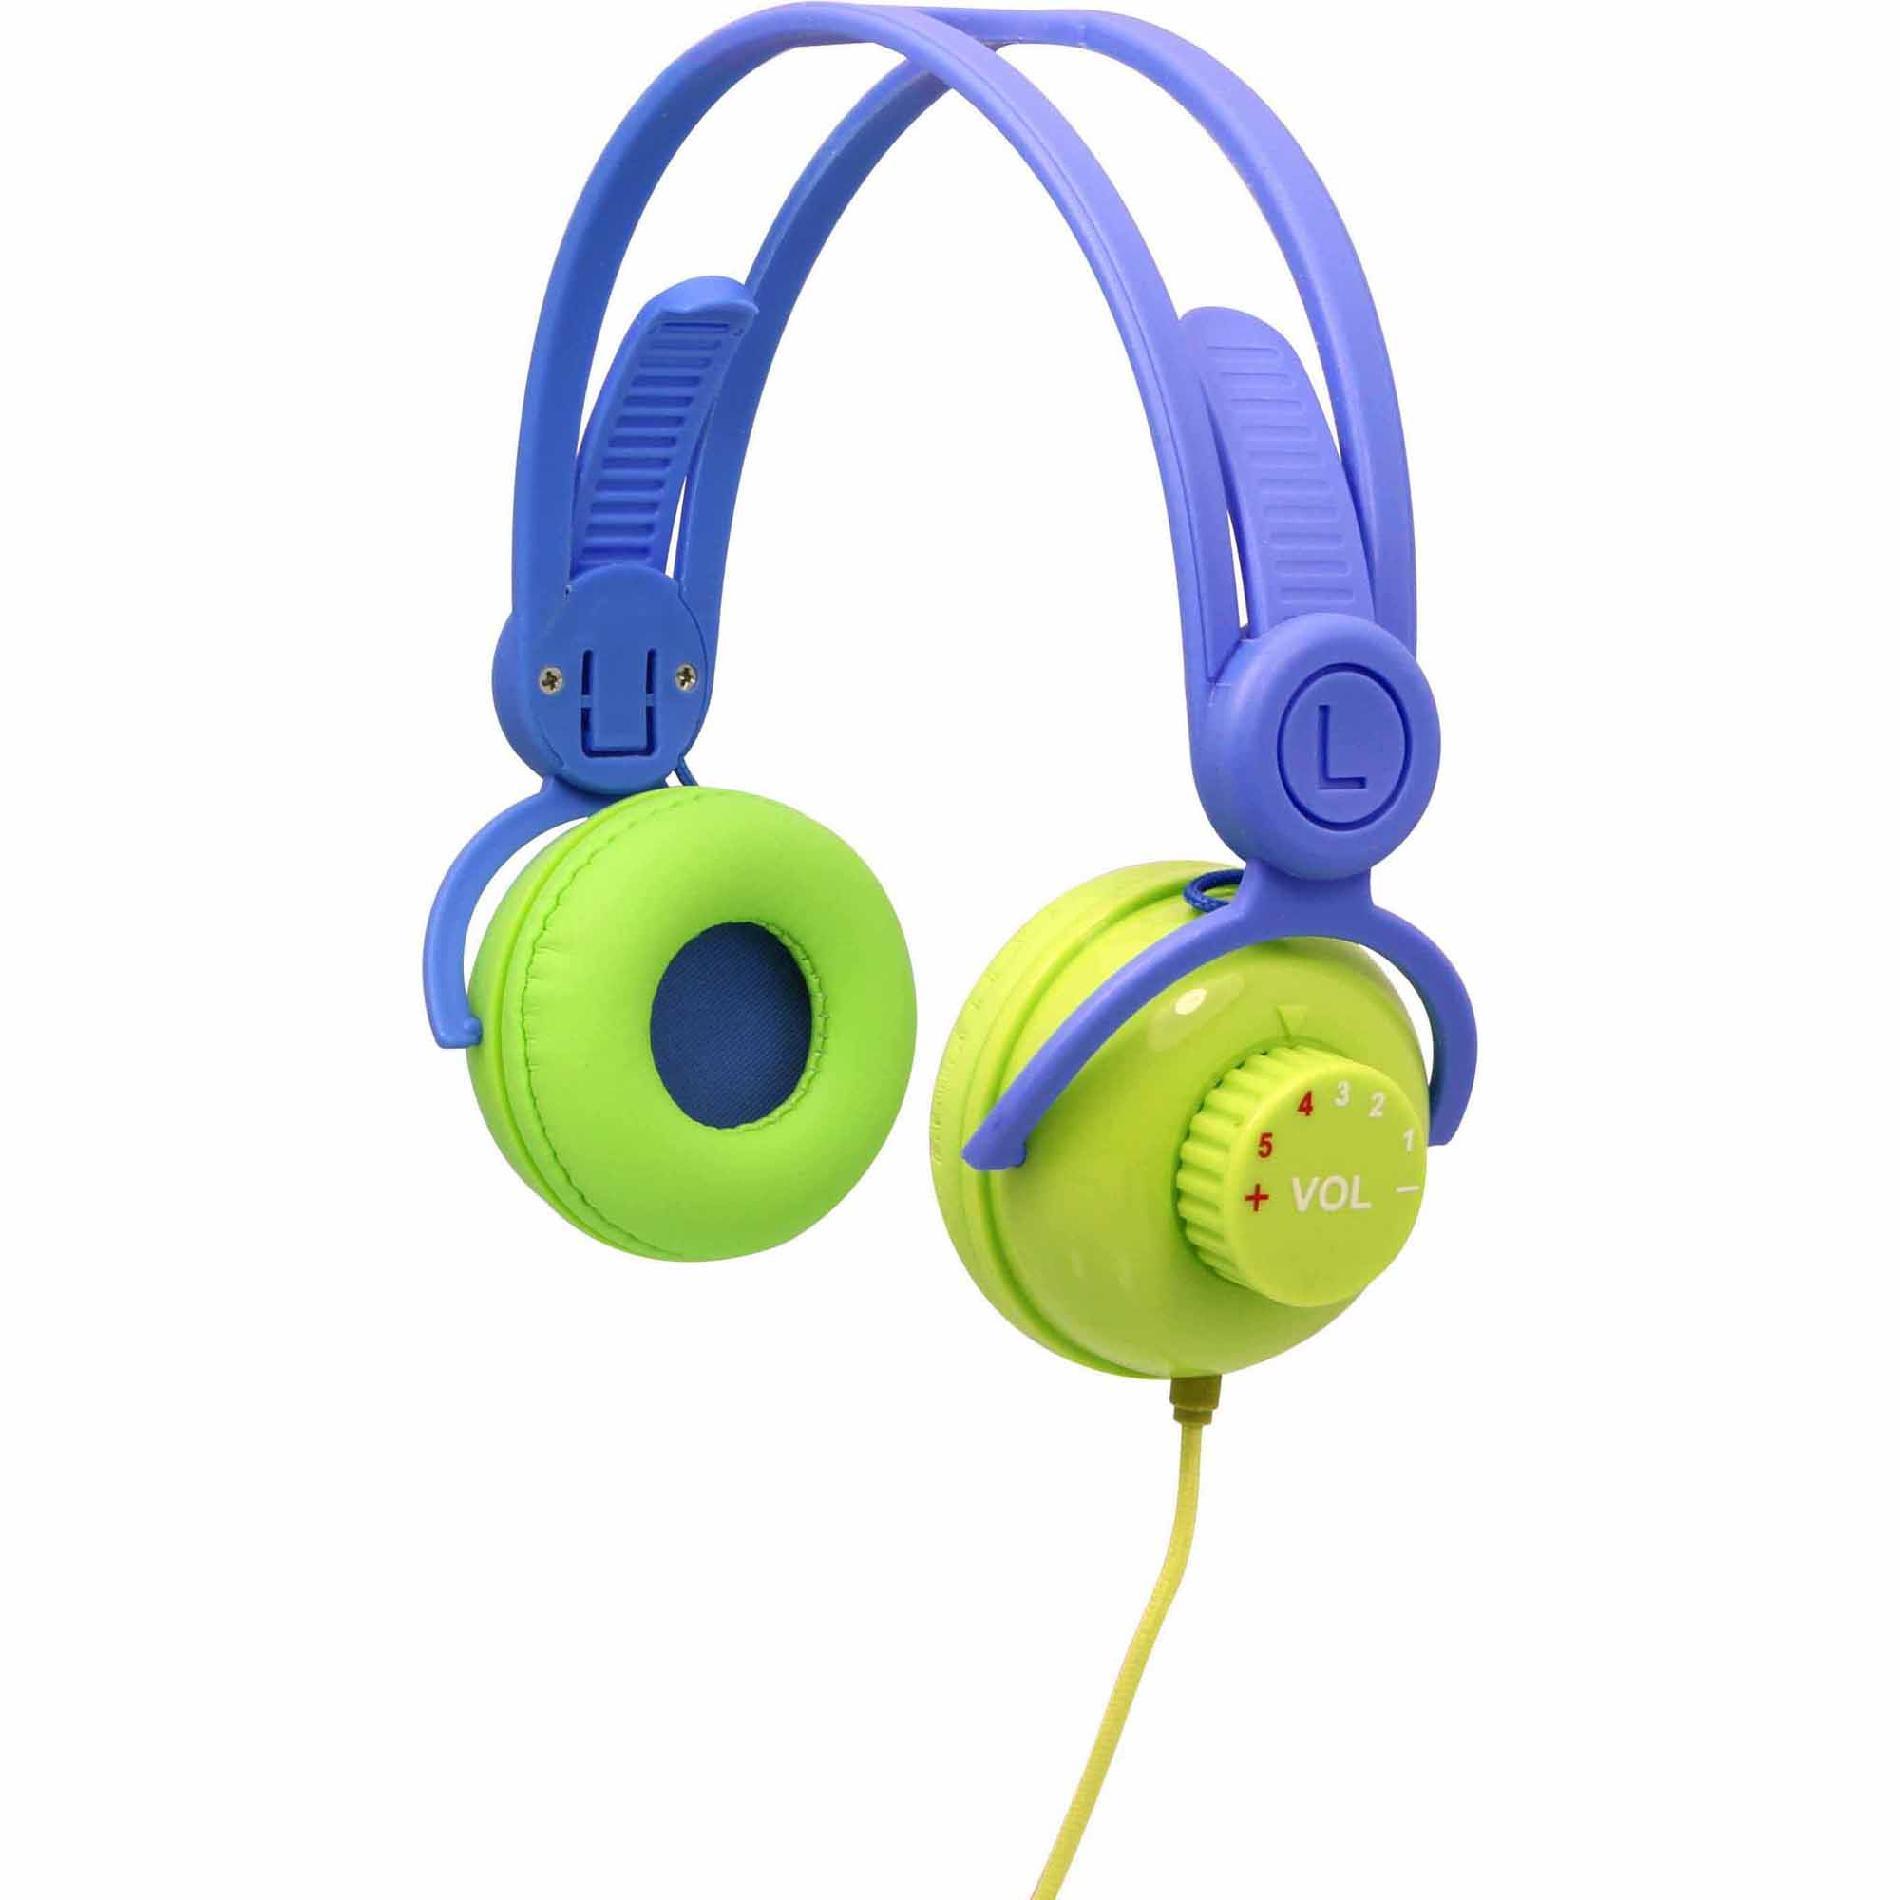 Nakamichi  NK KIDZ Headphones Blue and Green $7.49 + $5 SYWR KMART